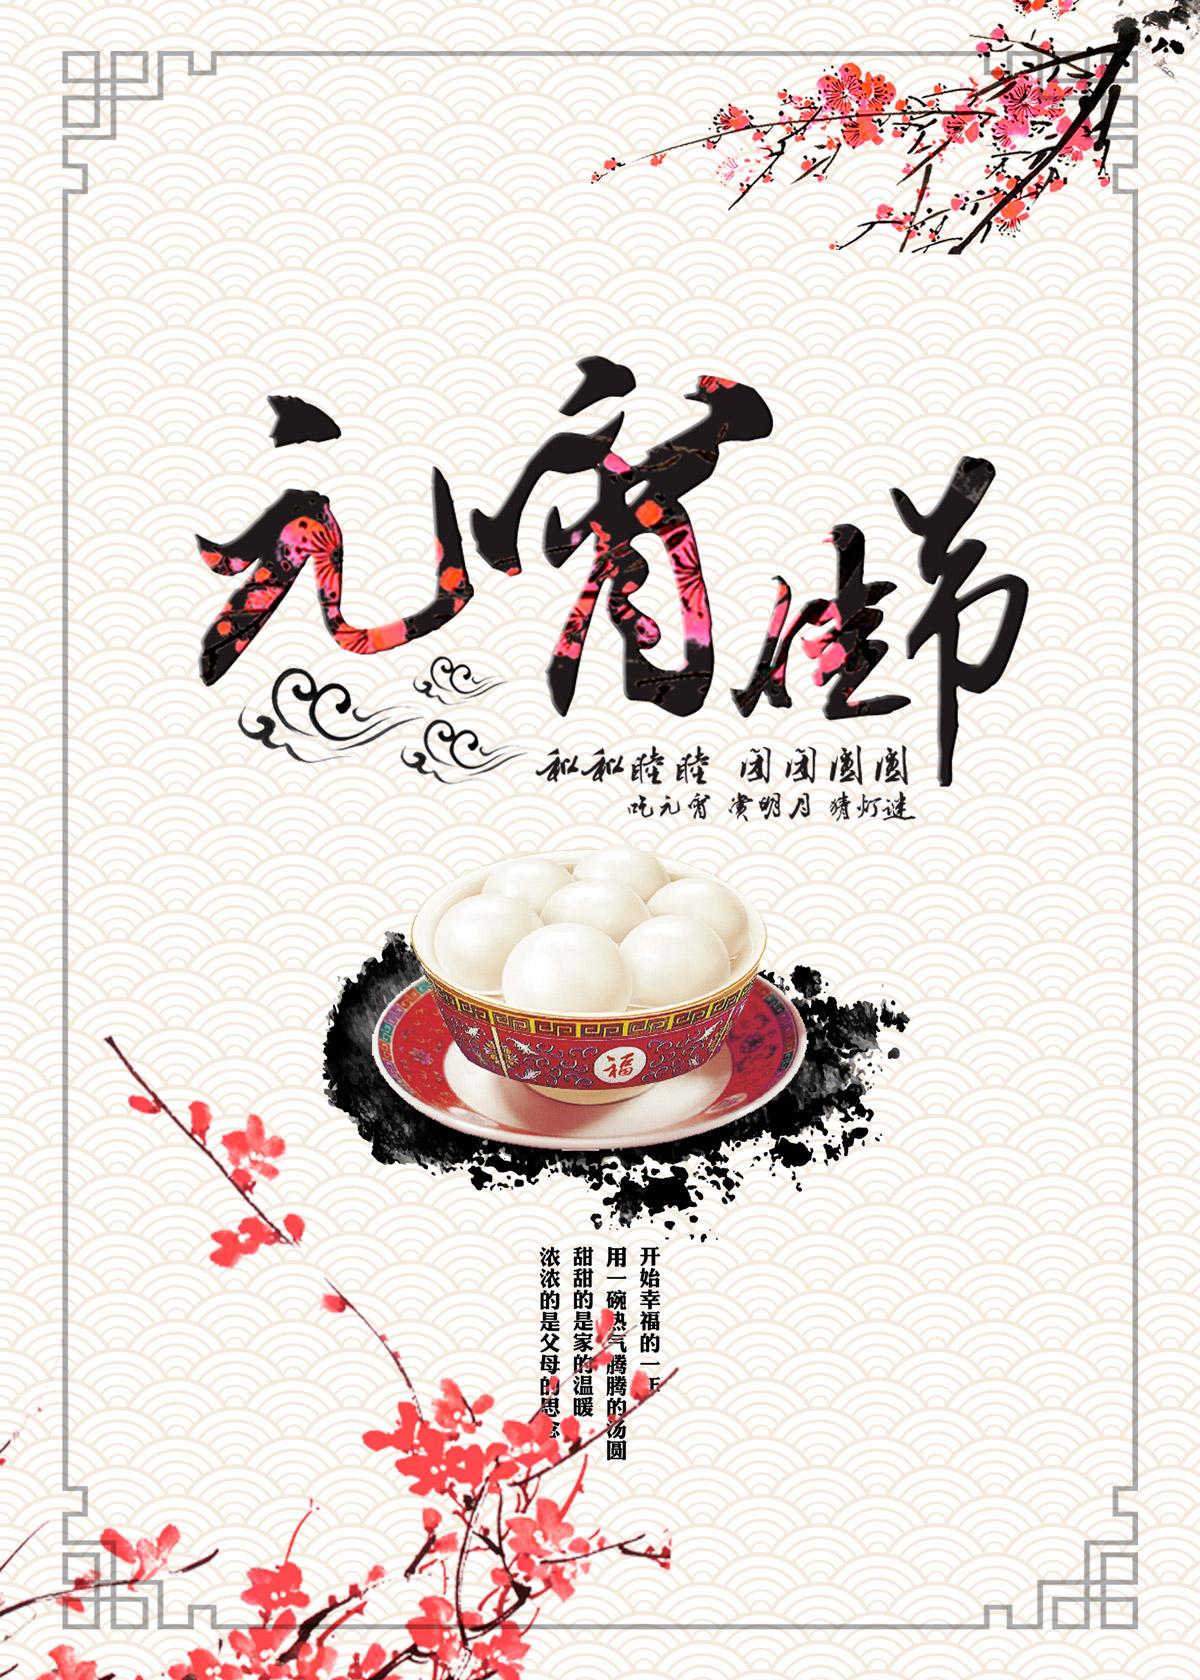 Best Poster ?-chinesefontdesign-com-2018-03-01_13-40-a